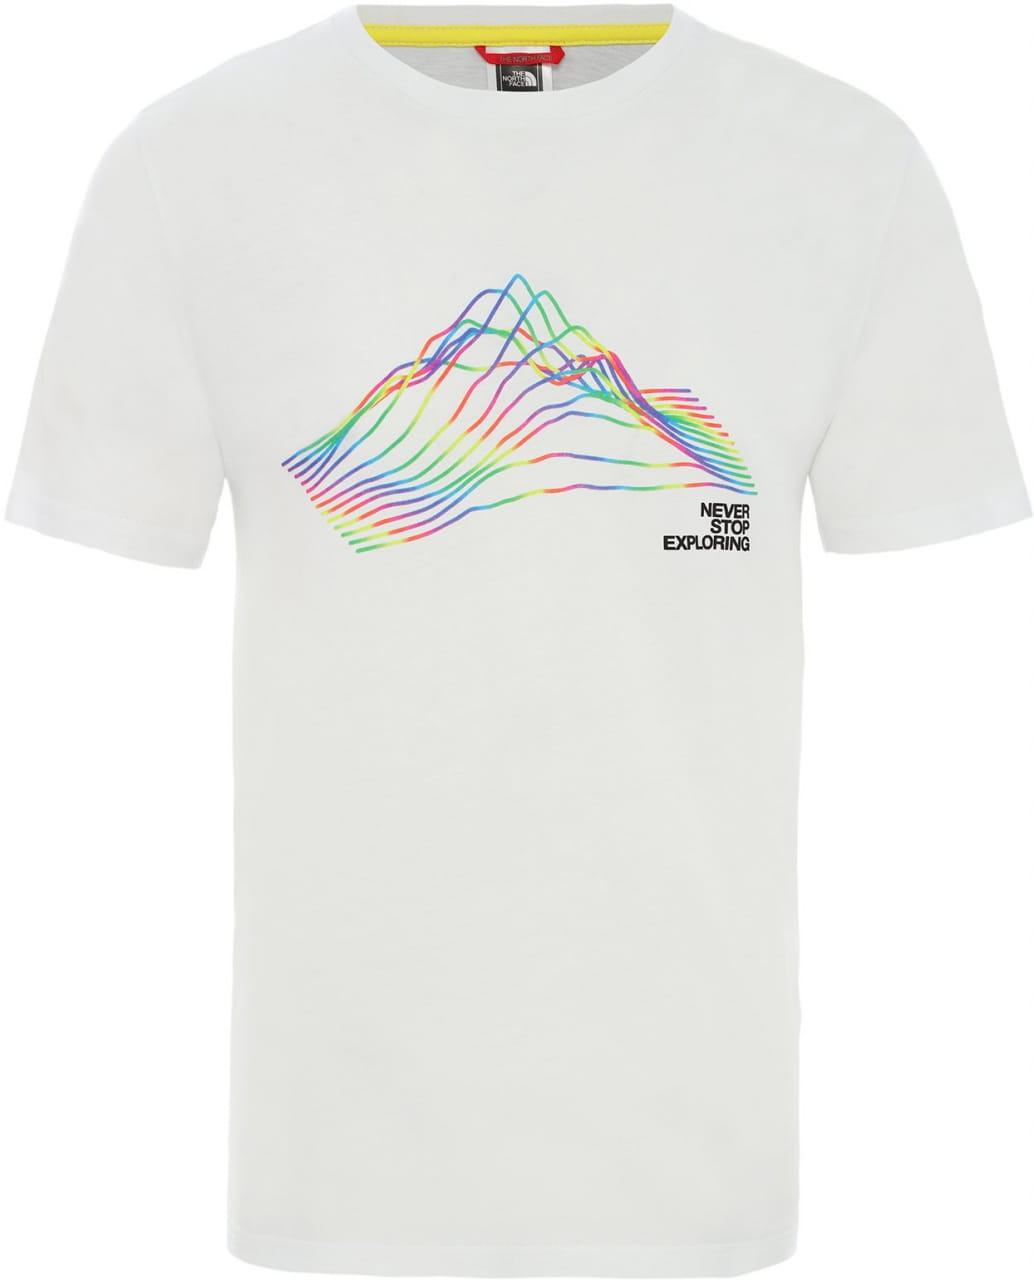 T-Shirts The North Face Men's Rainbow T-Shirt